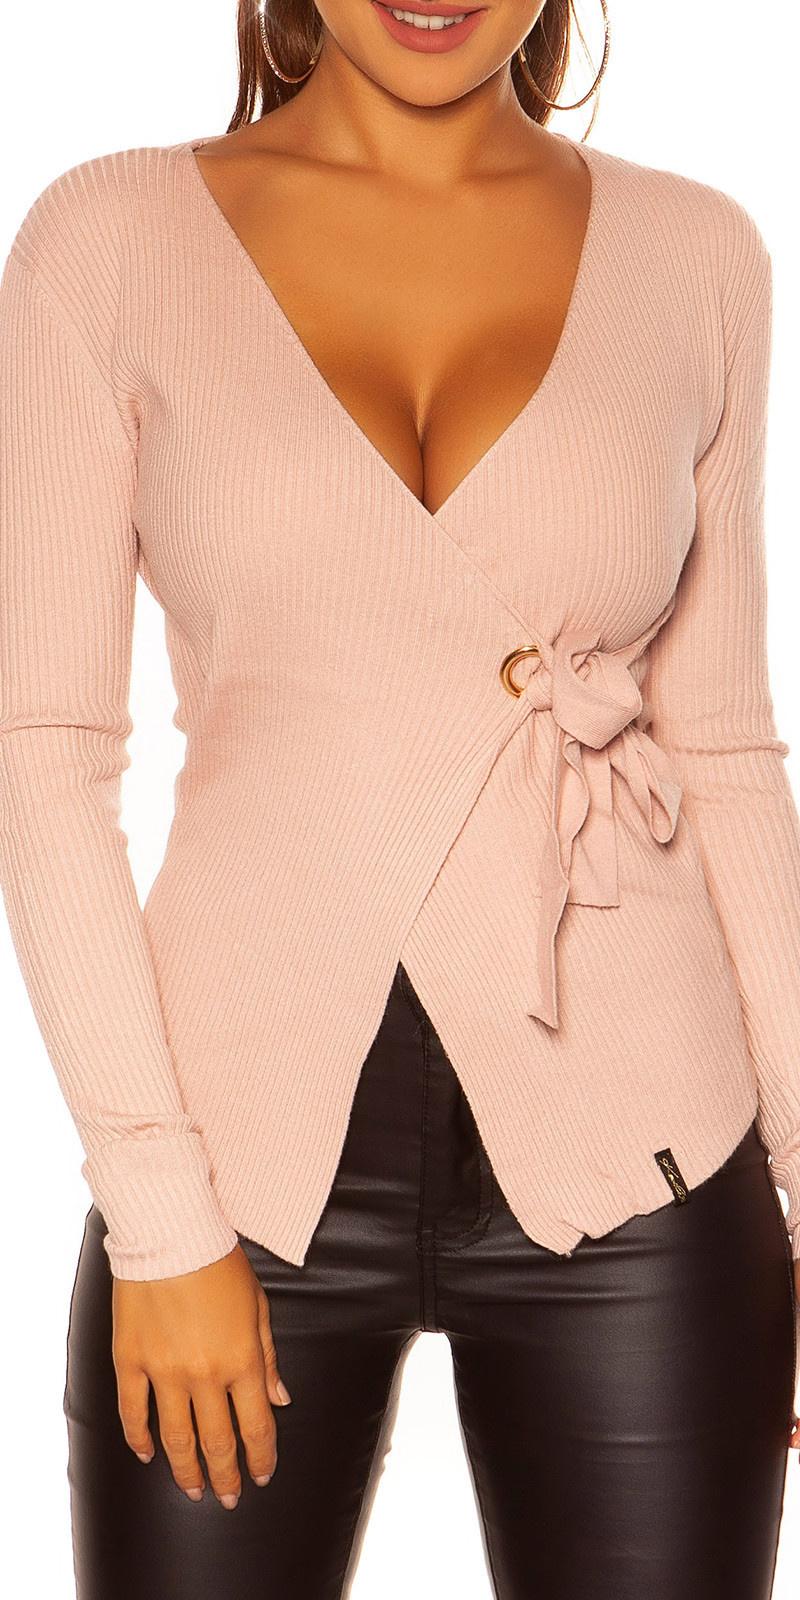 Sexy wikkel sweater-trui antiekroze